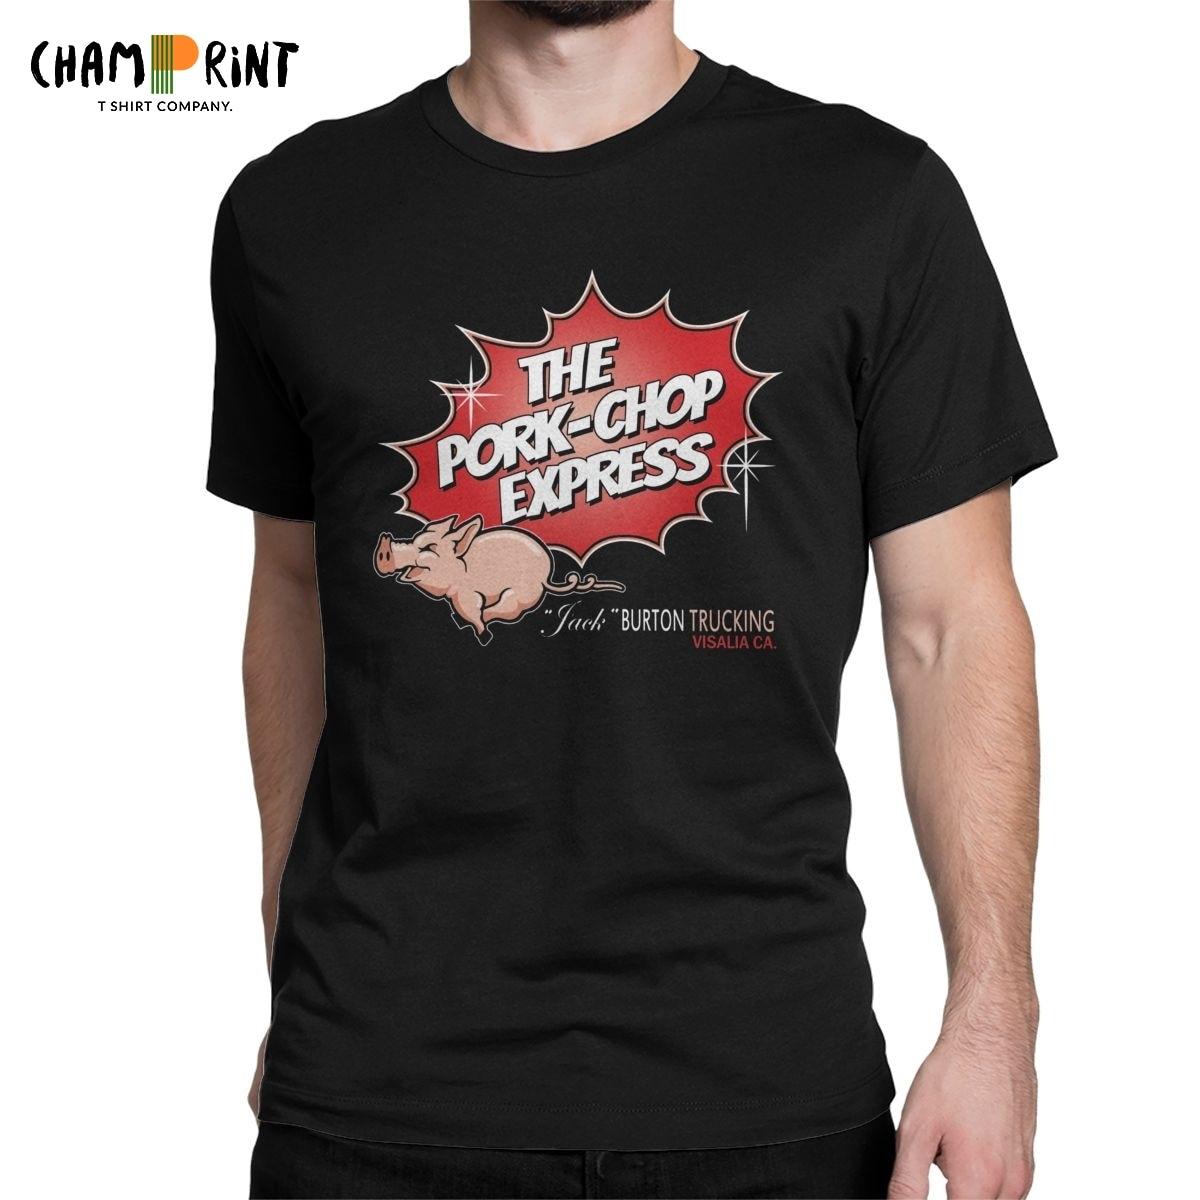 Men T-Shirt Big Trouble In Little China Pork Chop Express Unique Cotton Tees Short Sleeve T Shirts Crew Neck Clothing Plus Size